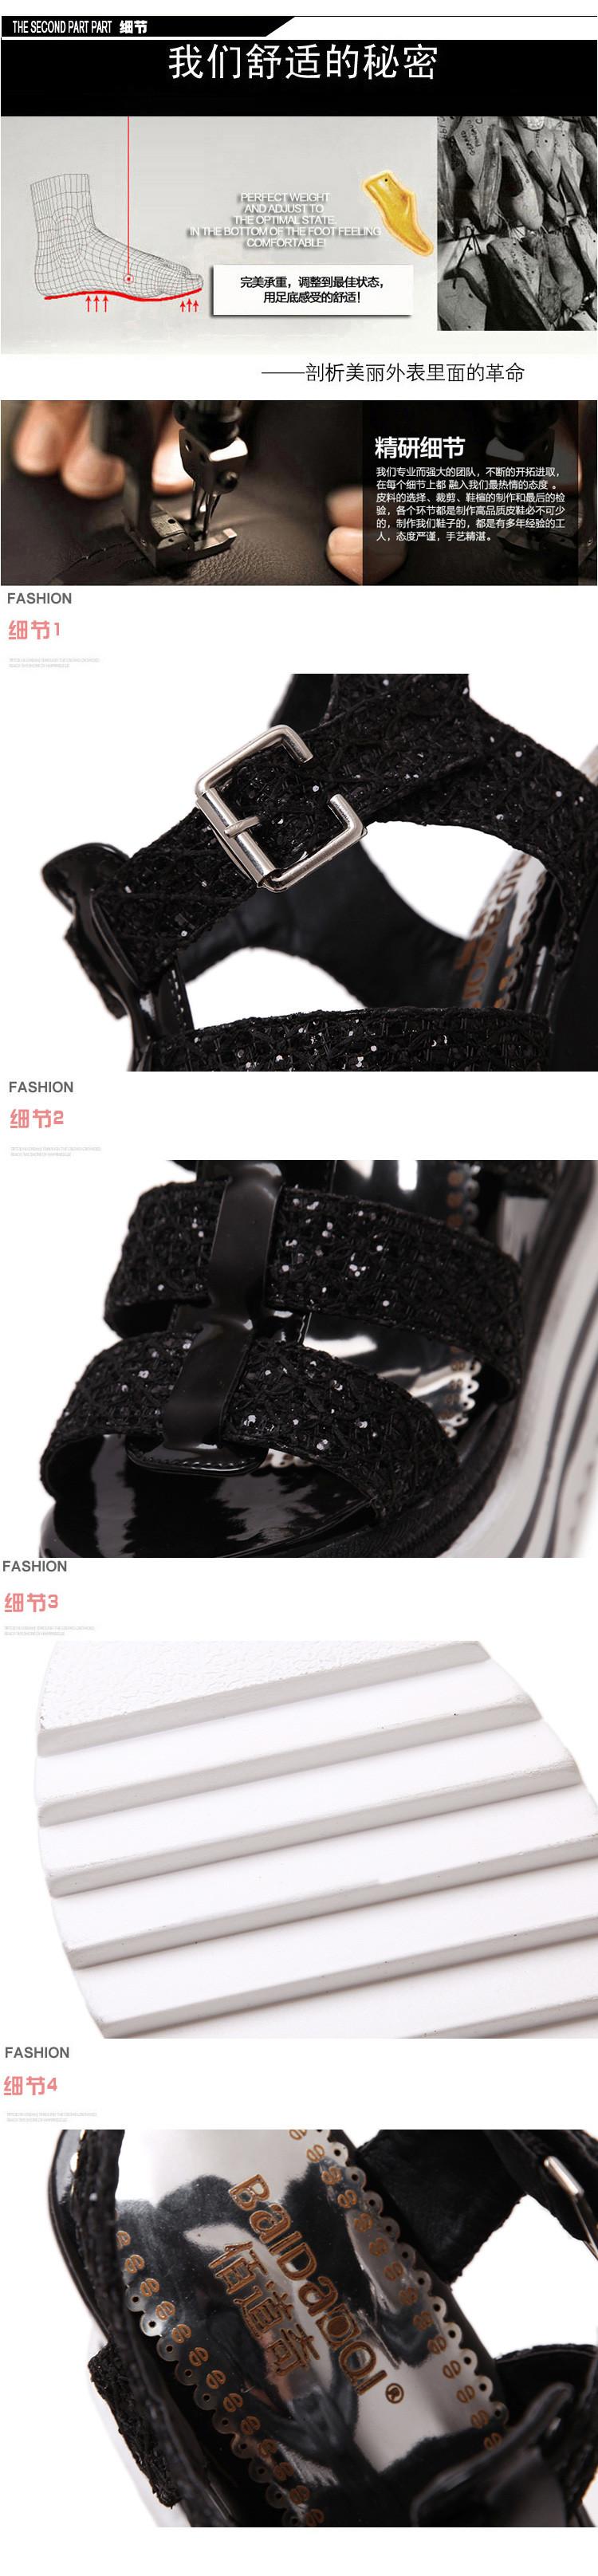 2016 Summer New Korean Casual Footwear Fashion Womens Black Platform Wedge Sandals For Ladies Discount